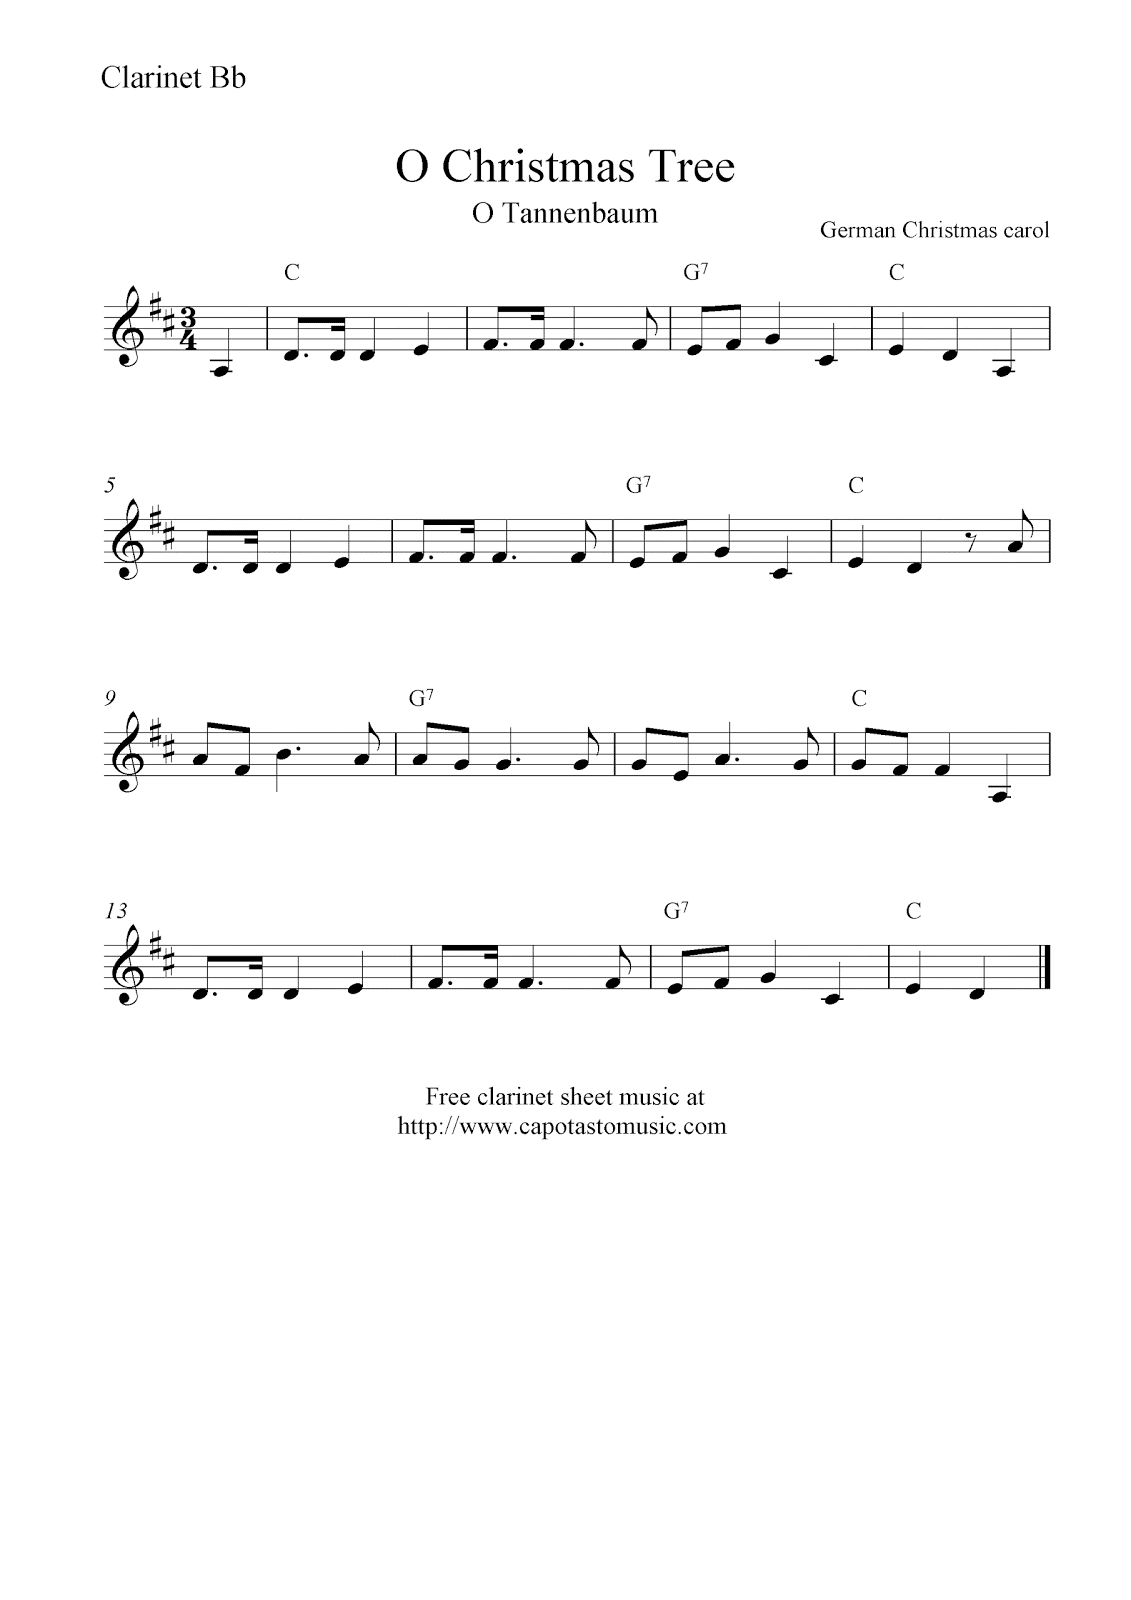 Tree o tannenbaum free christmas clarinet sheet music notes